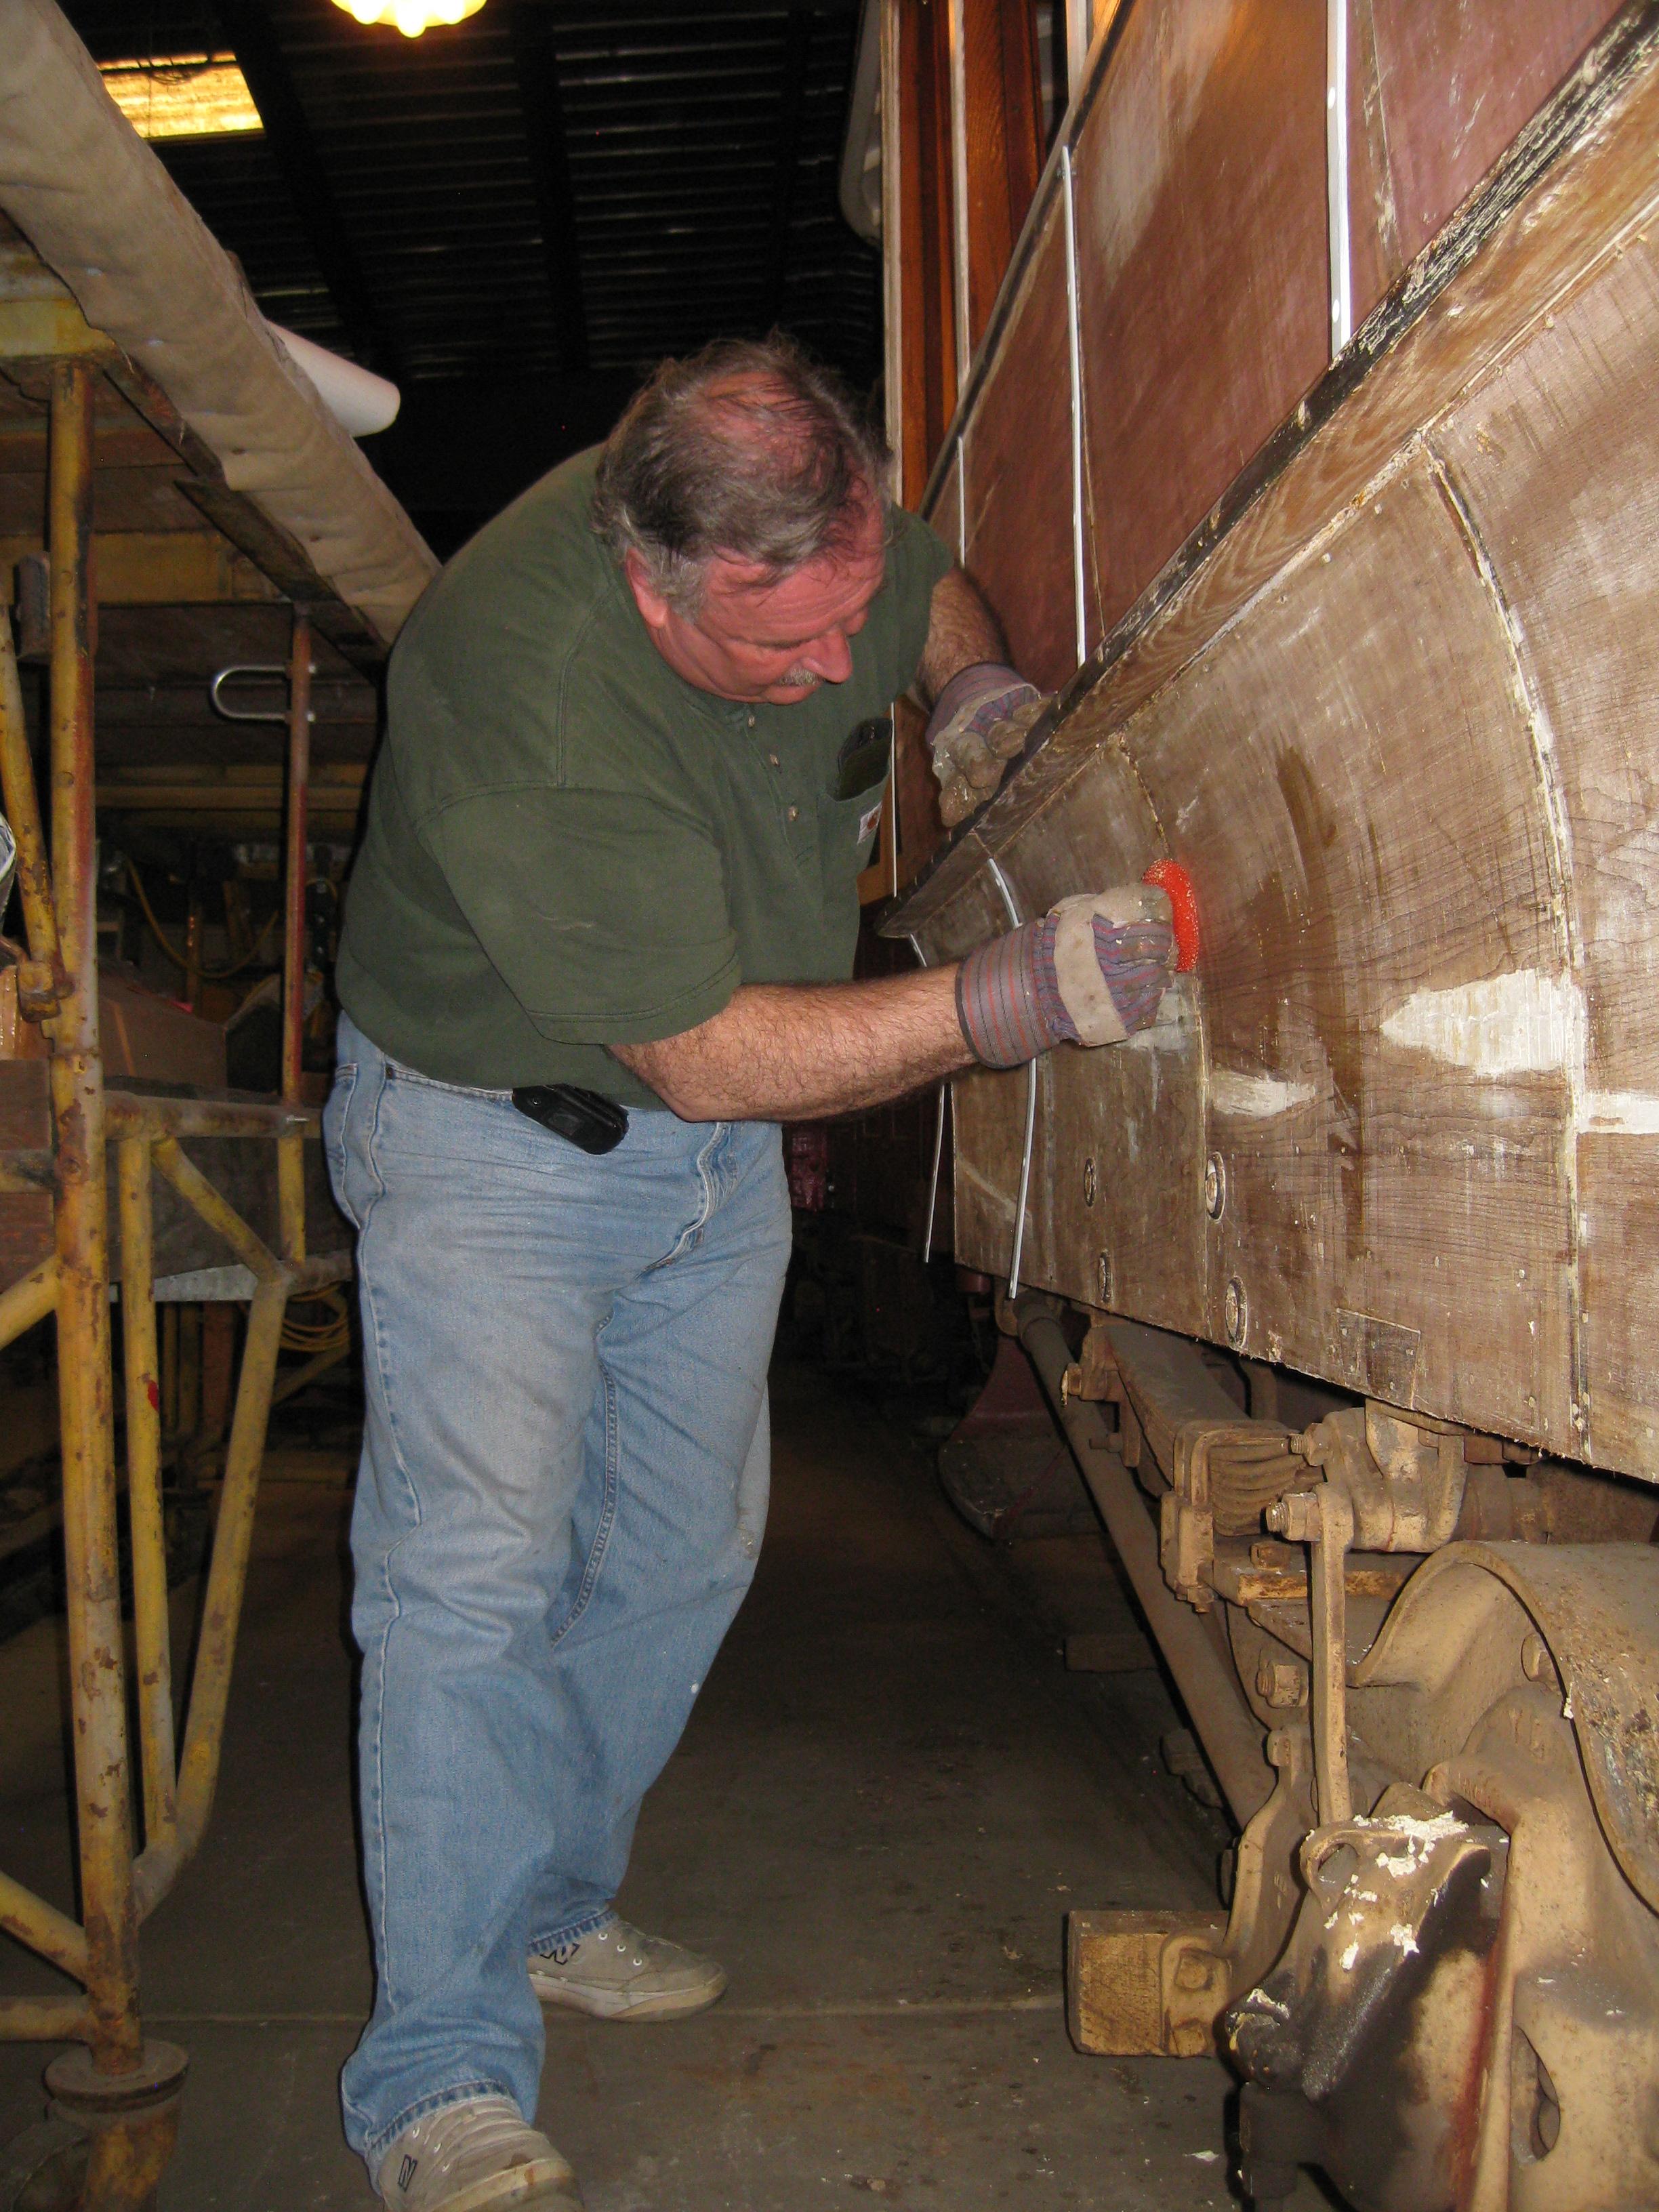 BSM Member Dave Wilson restoring a collection car. Image Credit: John La Costa